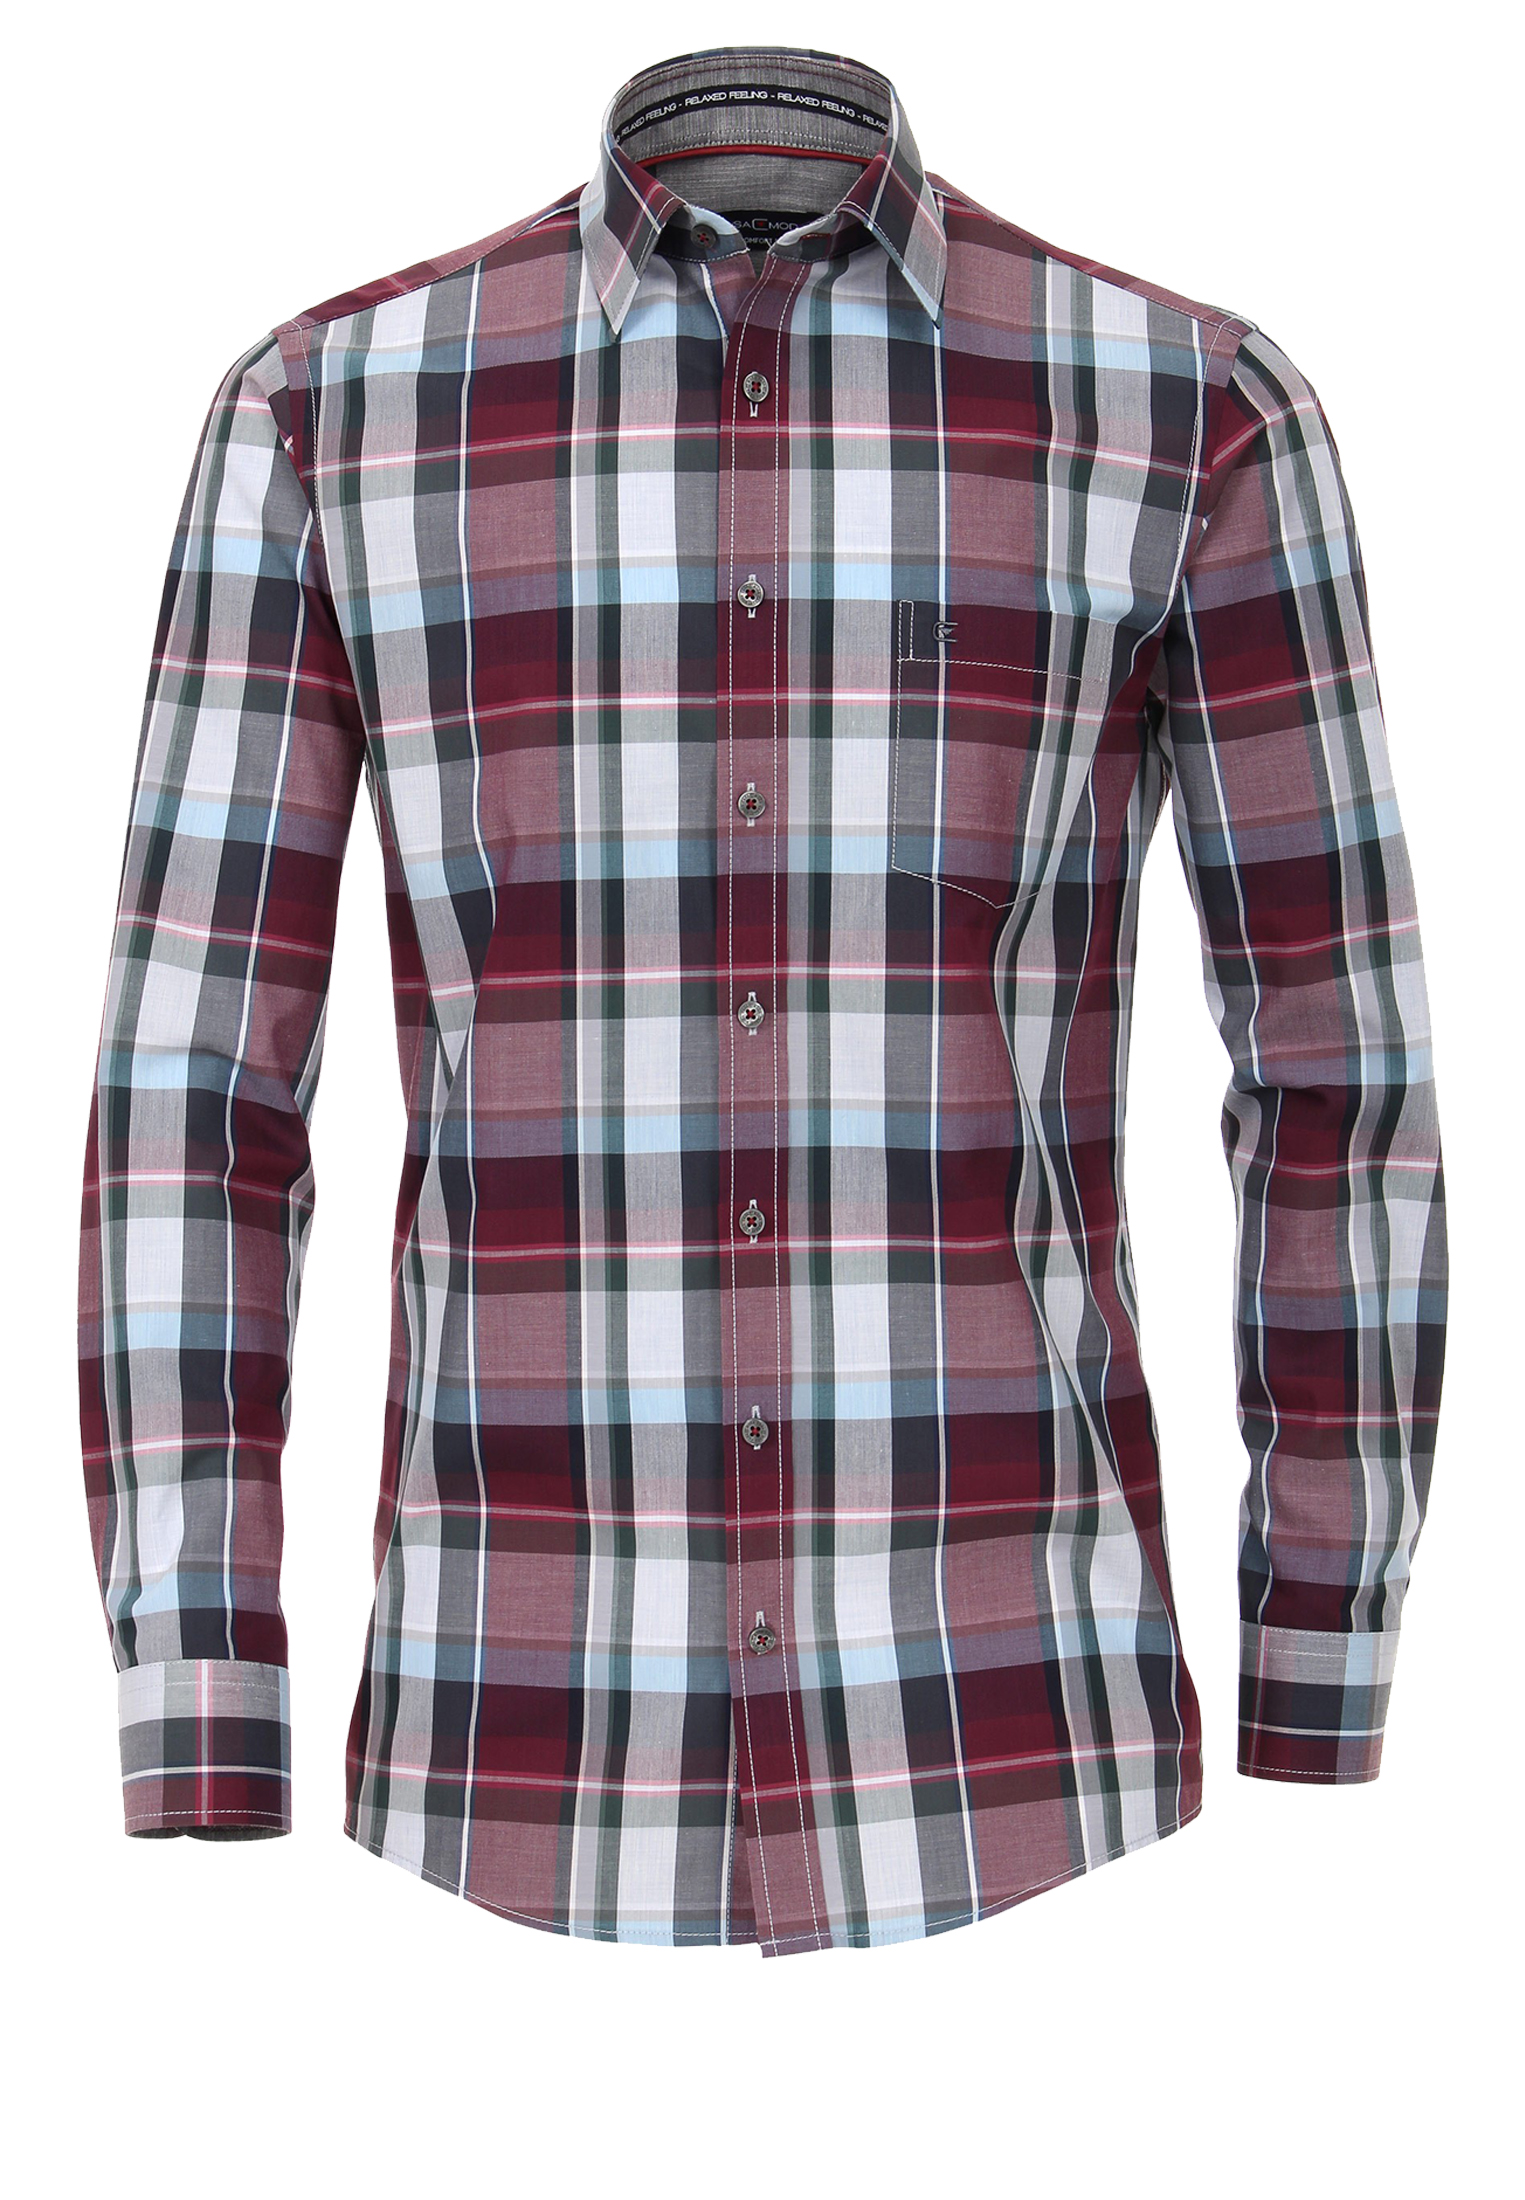 Overhemd Rood Zwart Geblokt.Casa Moda Overhemd 2xl 7xl Rood Bestel Nu Bij Melvinsi